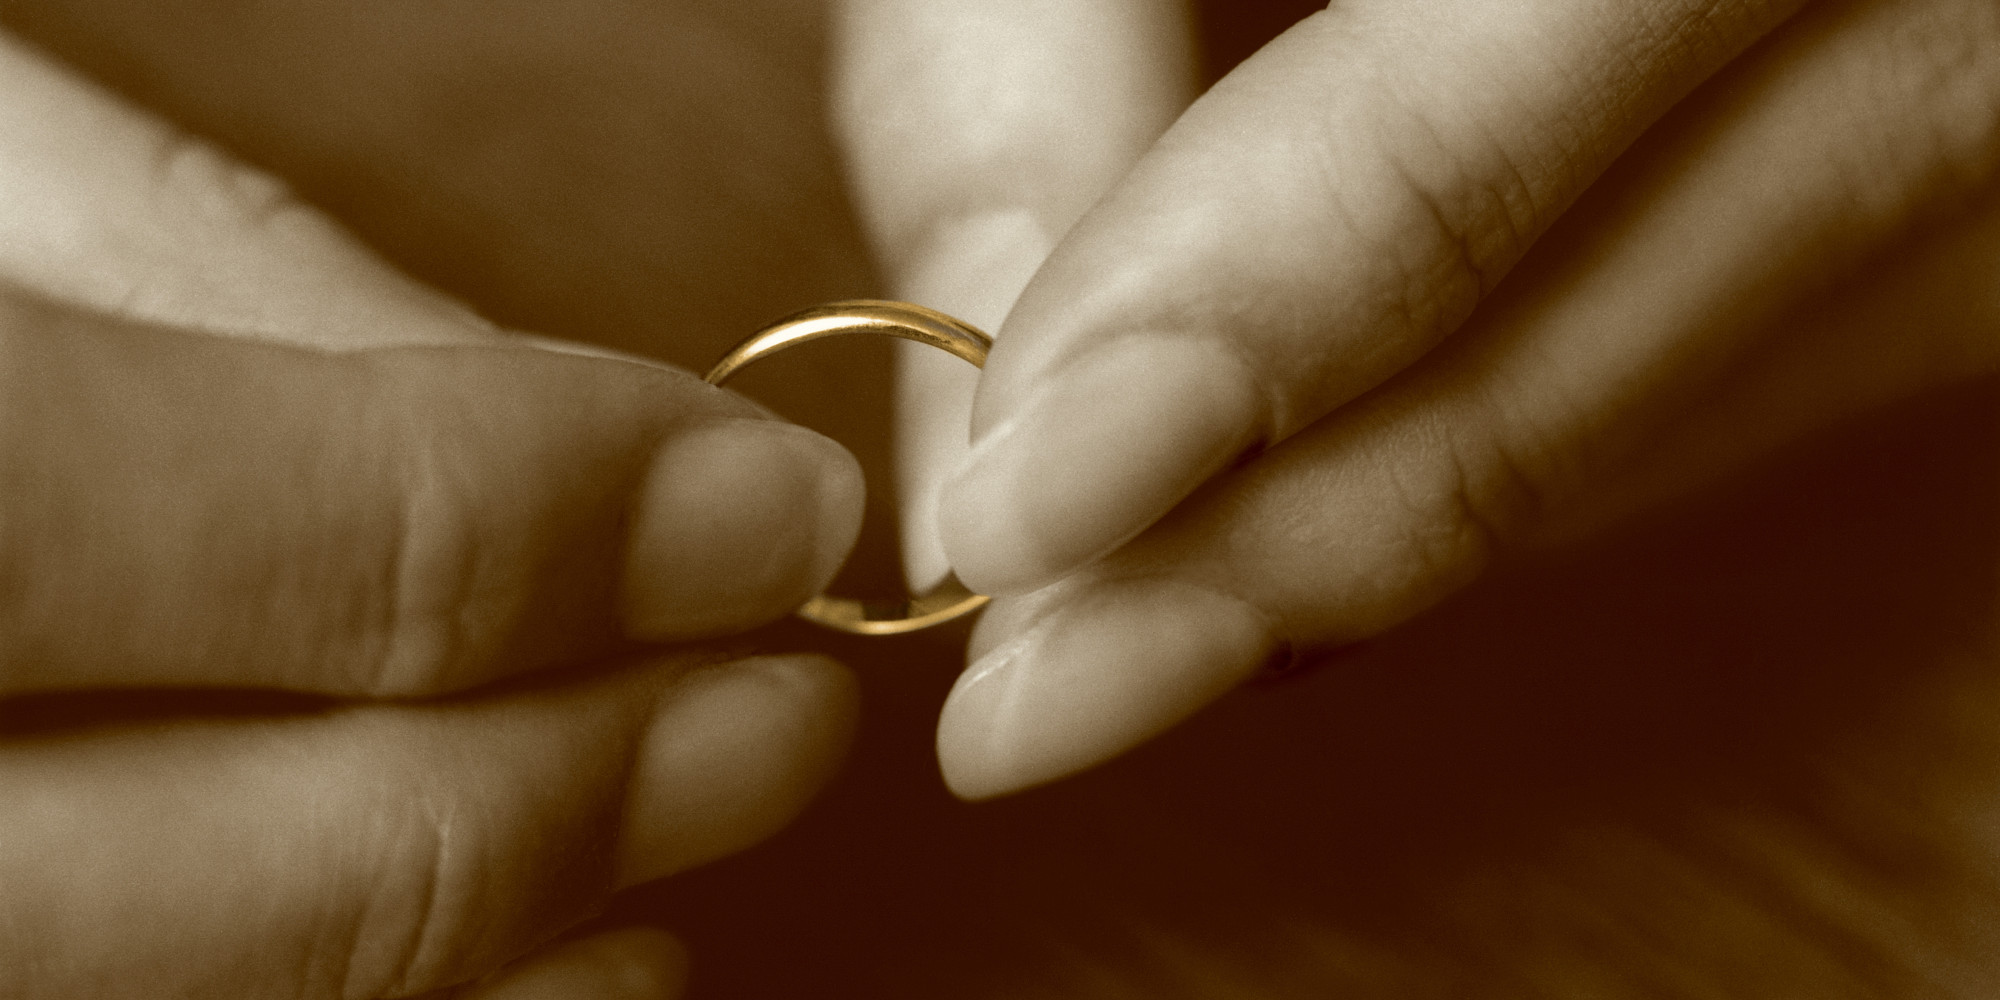 Image result for removingwedding ring